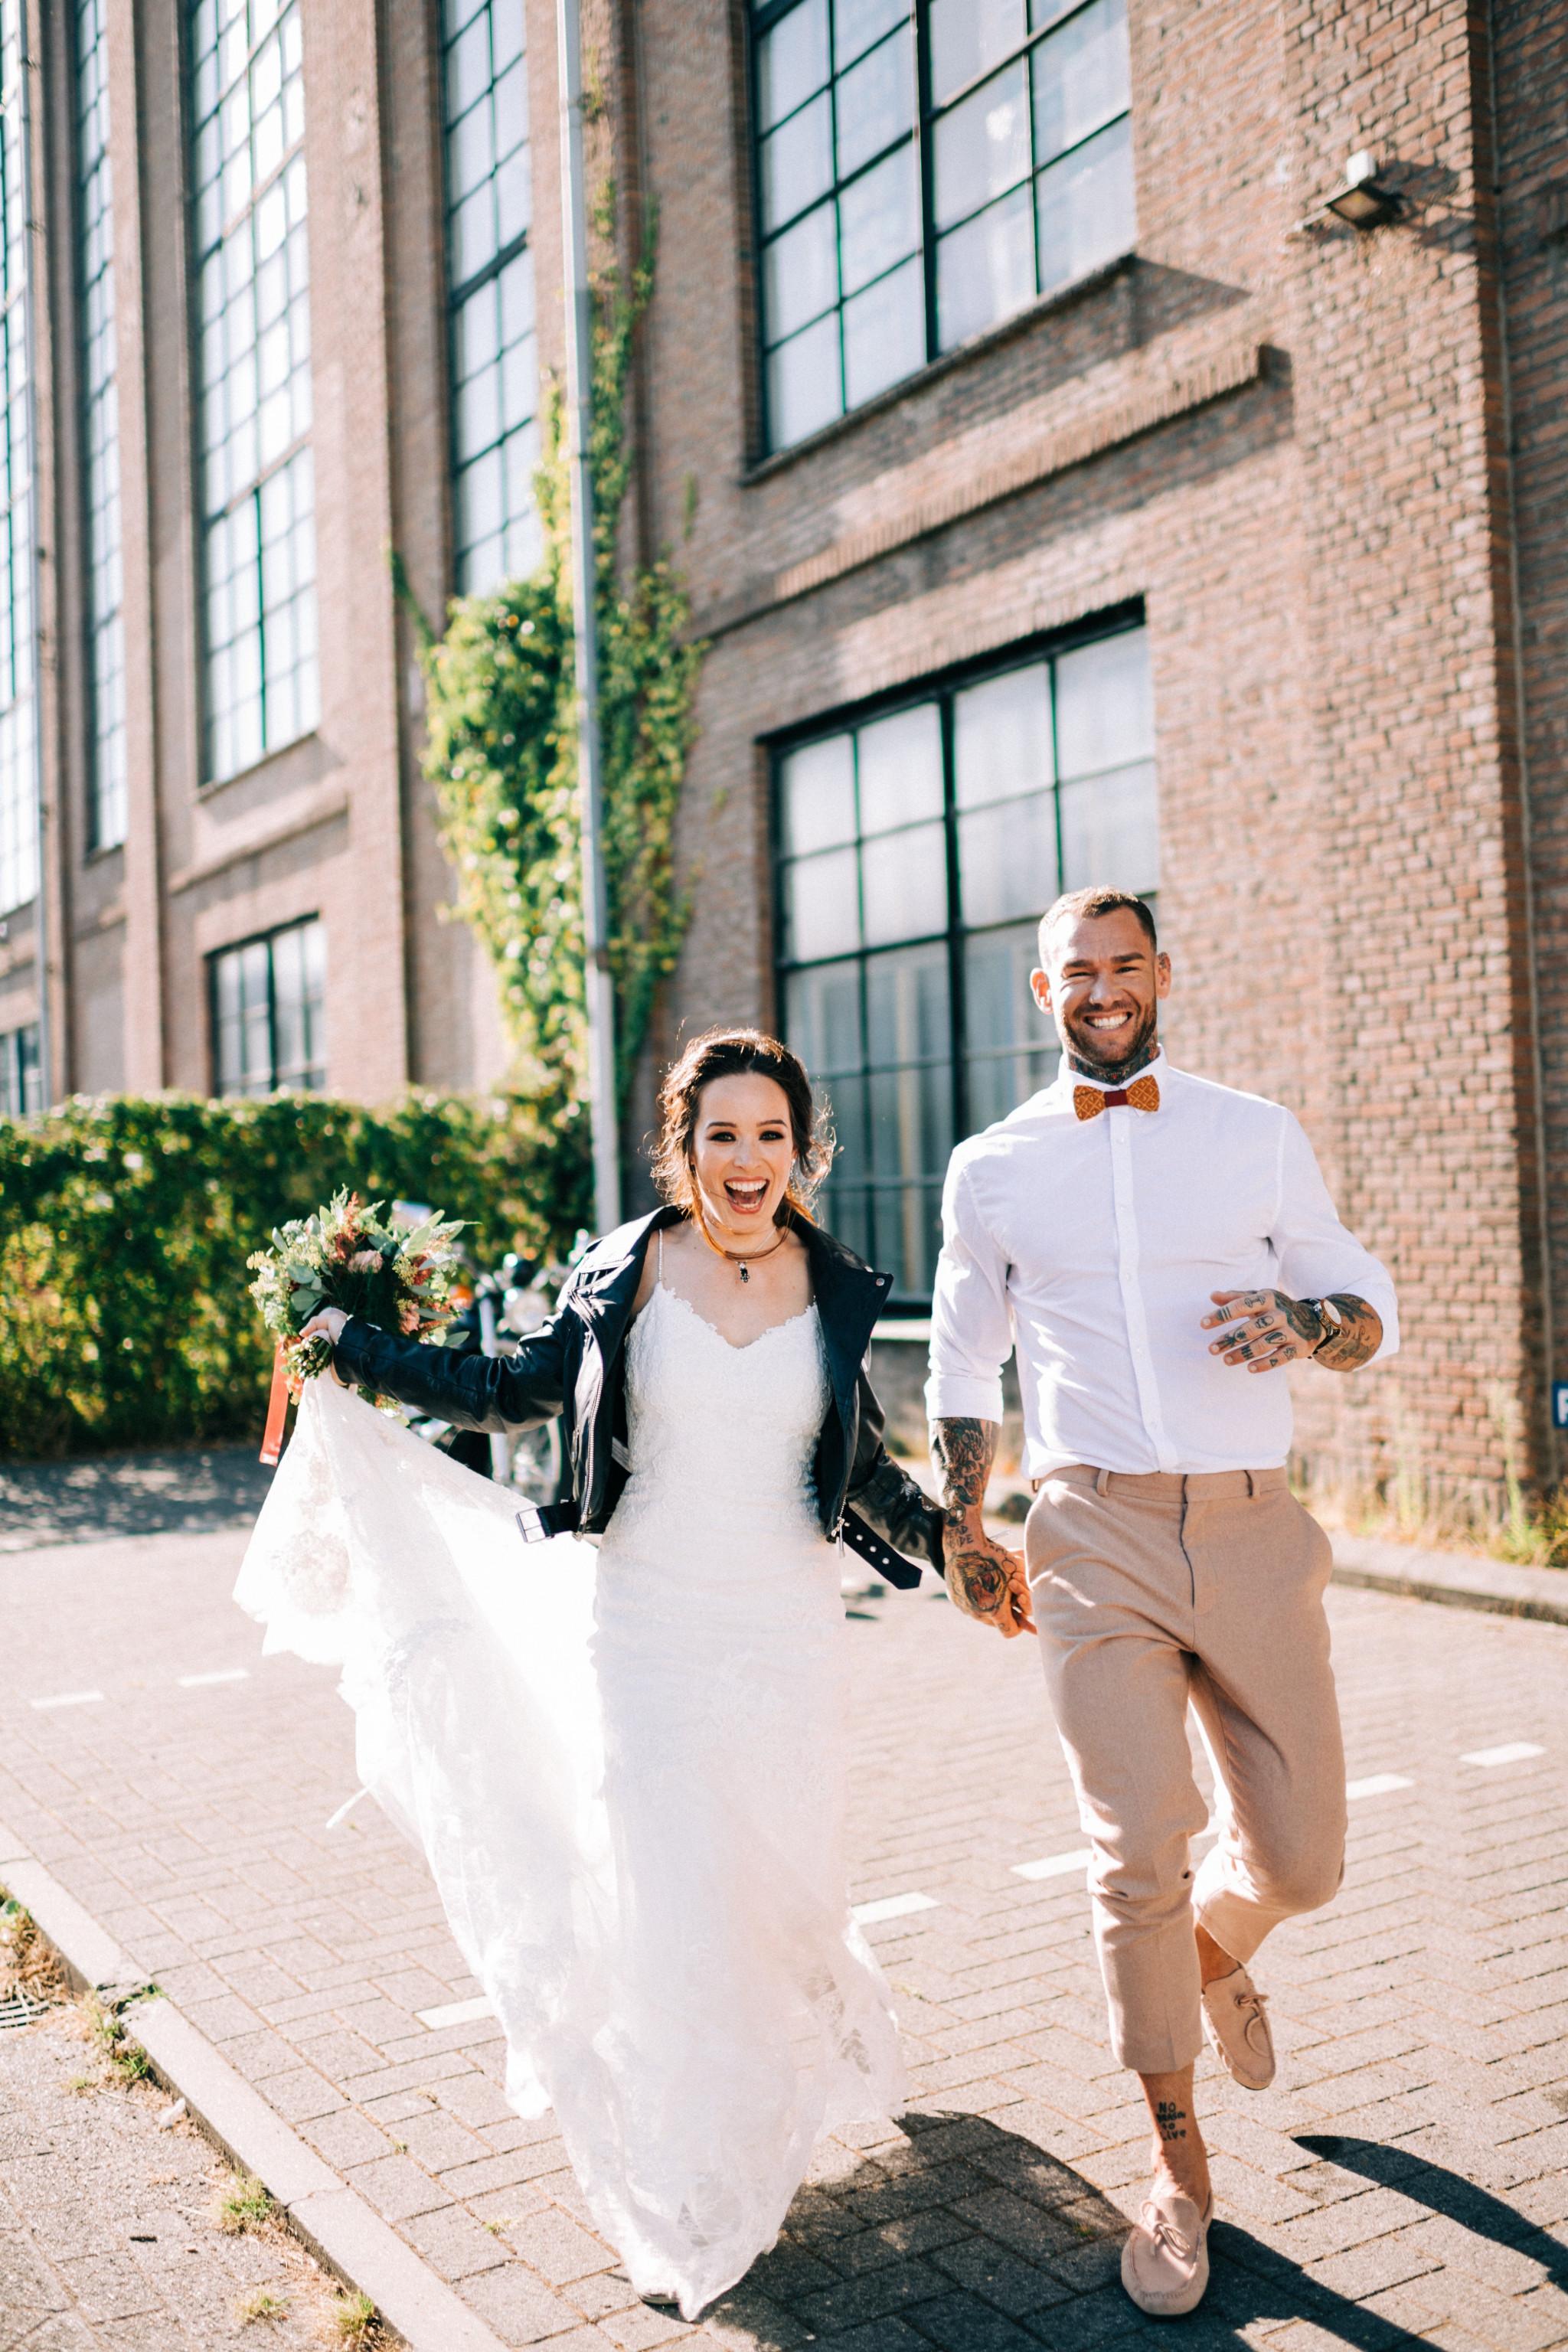 Wat Draag Je Over Je Bruidsjurk Theperfectwedding Nl